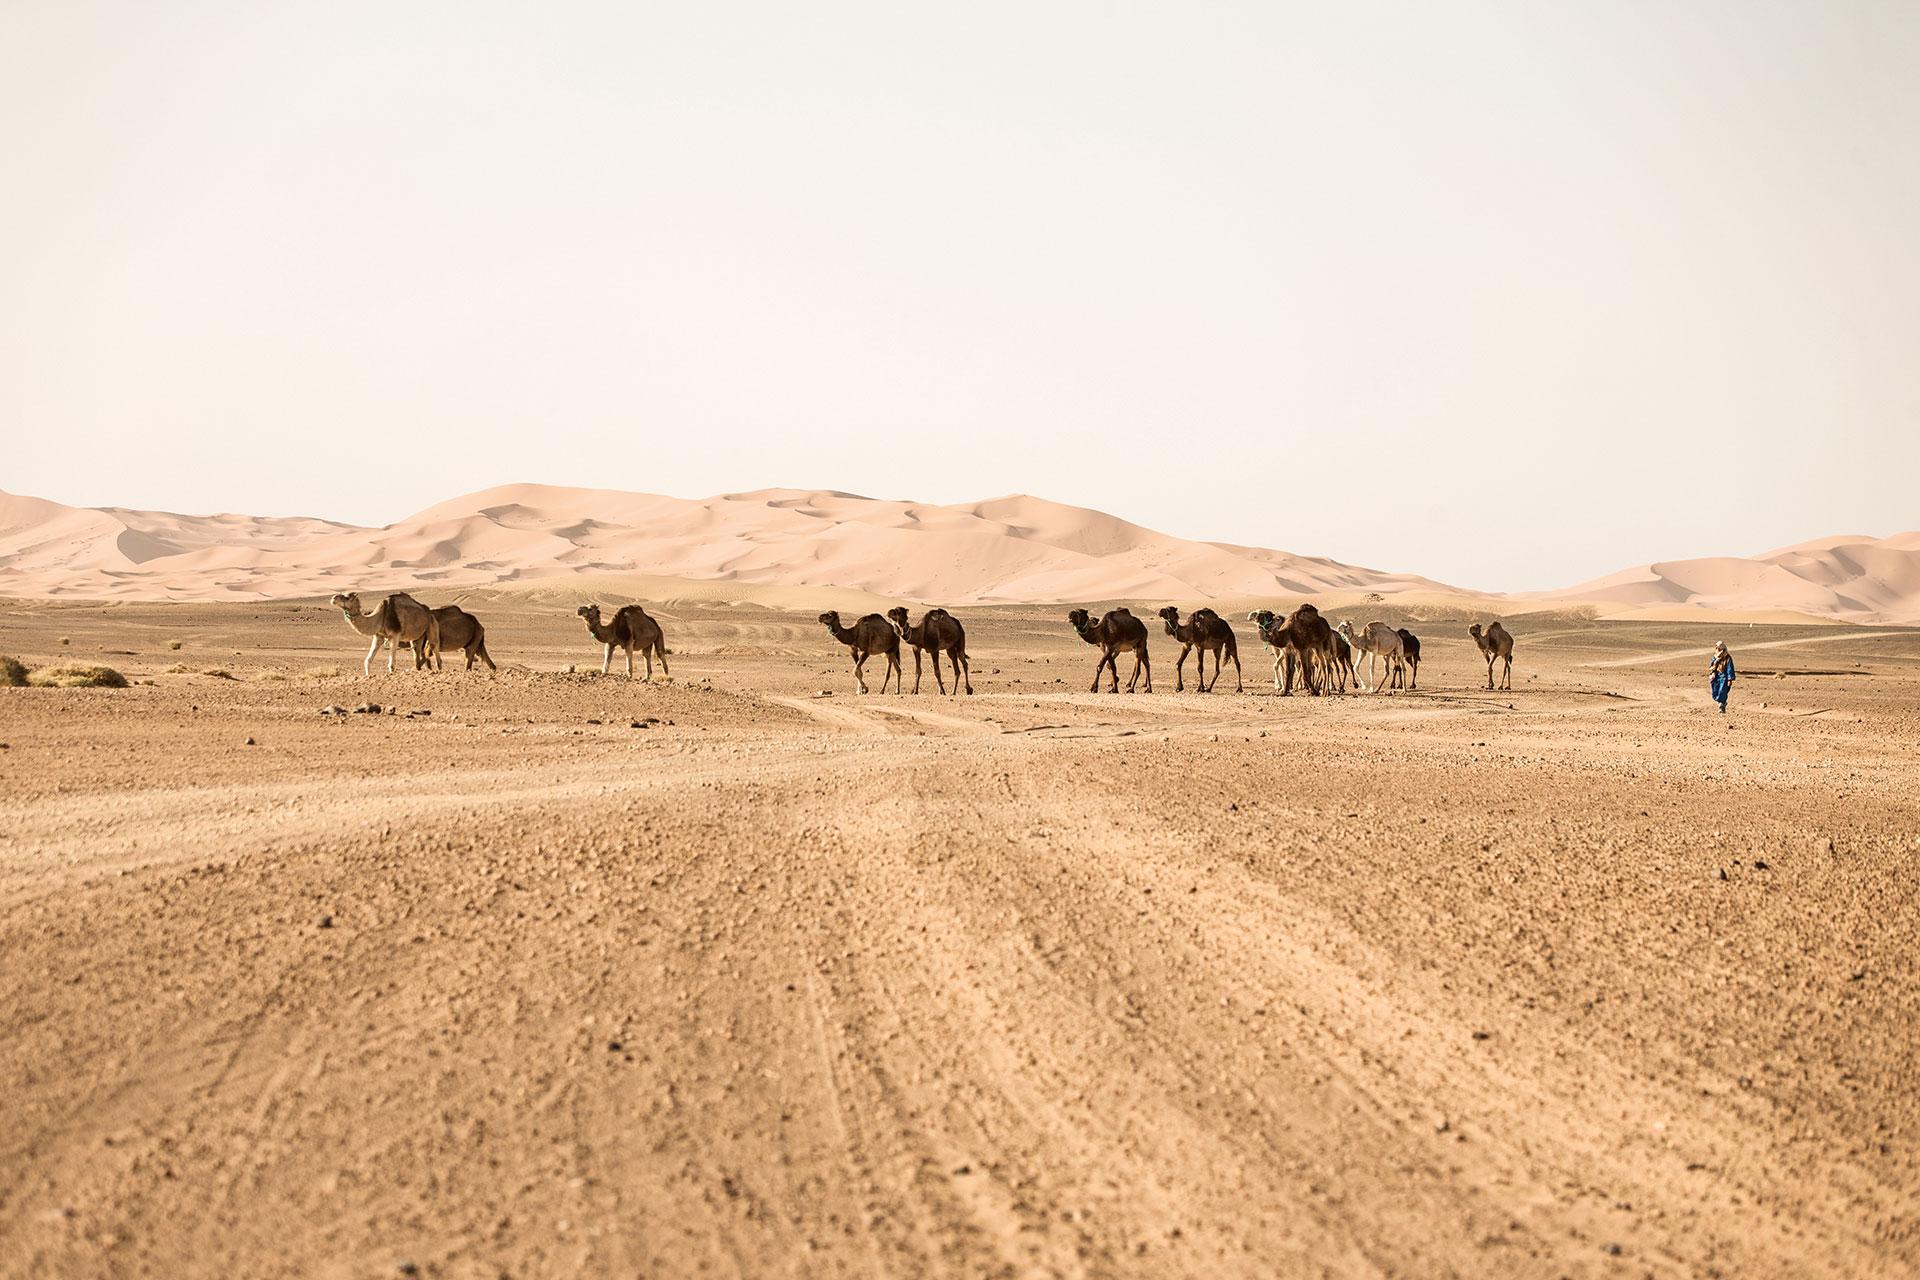 Reise Wüste Outdoor Landschaft Kamel Maloja Katalog Sahara Travel Michael Müller